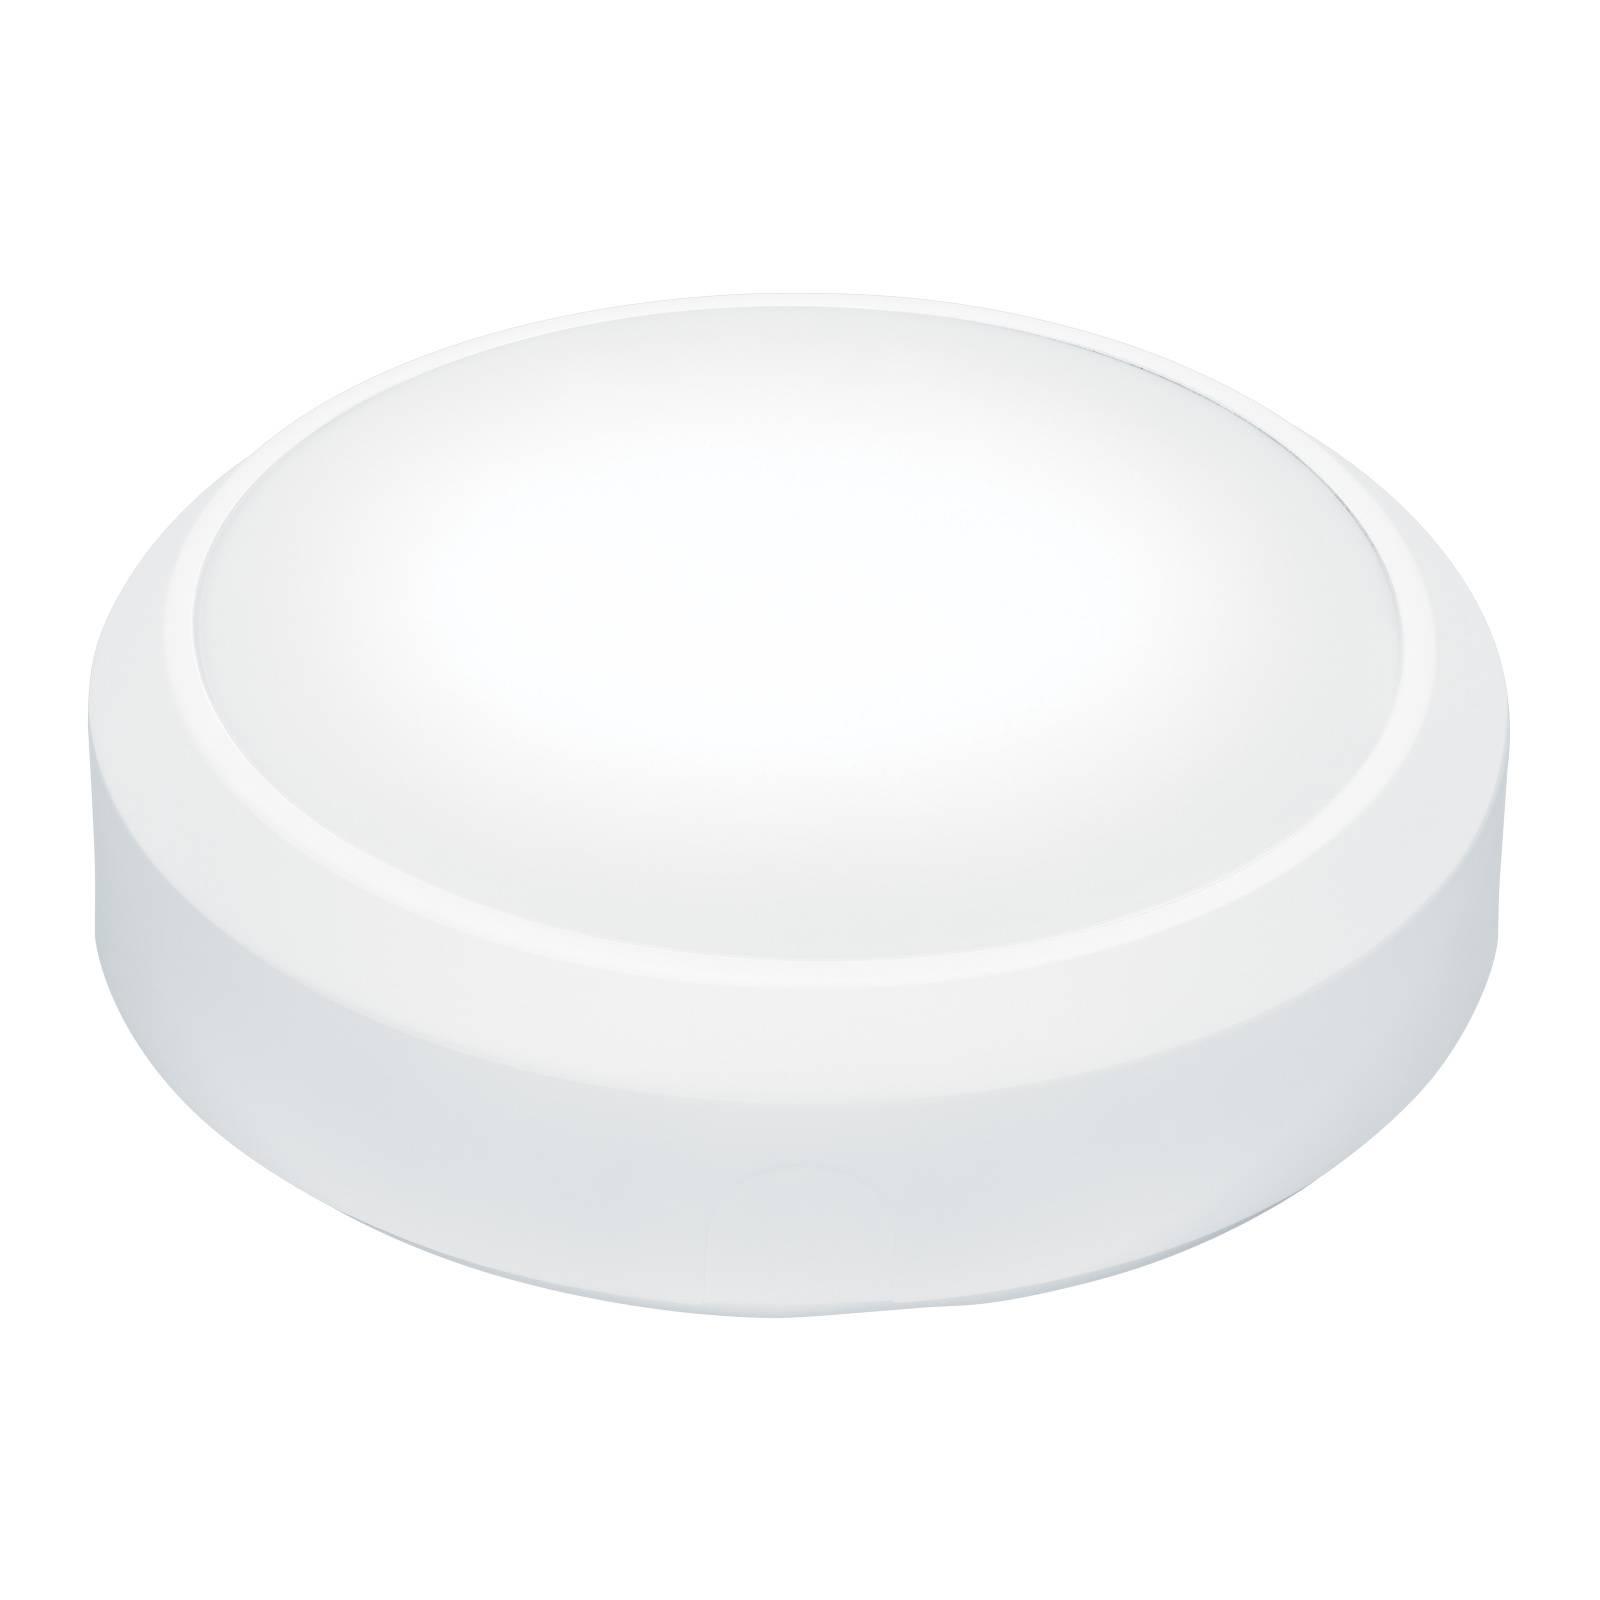 THORNeco Lara Wandleuchte Ø33 cm, weiß Ring Sensor